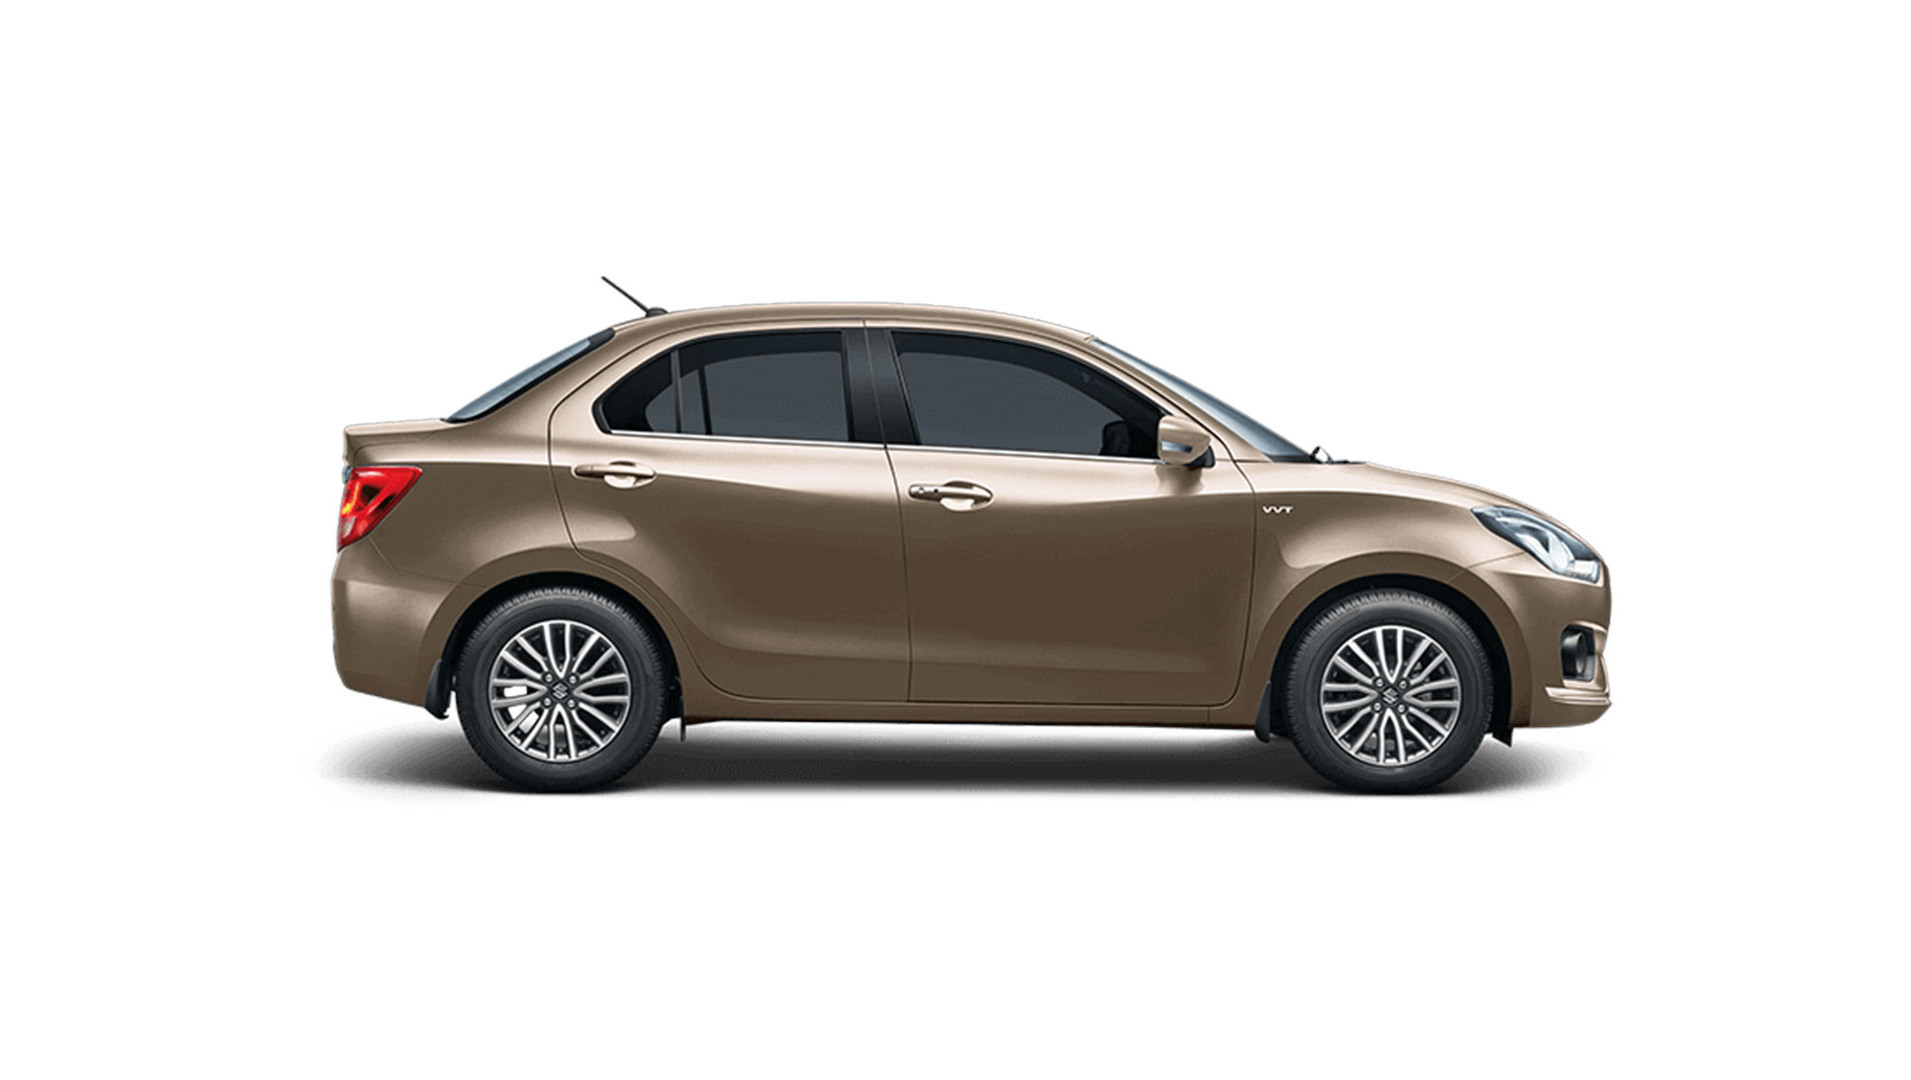 Rent Automatic car in Kerala